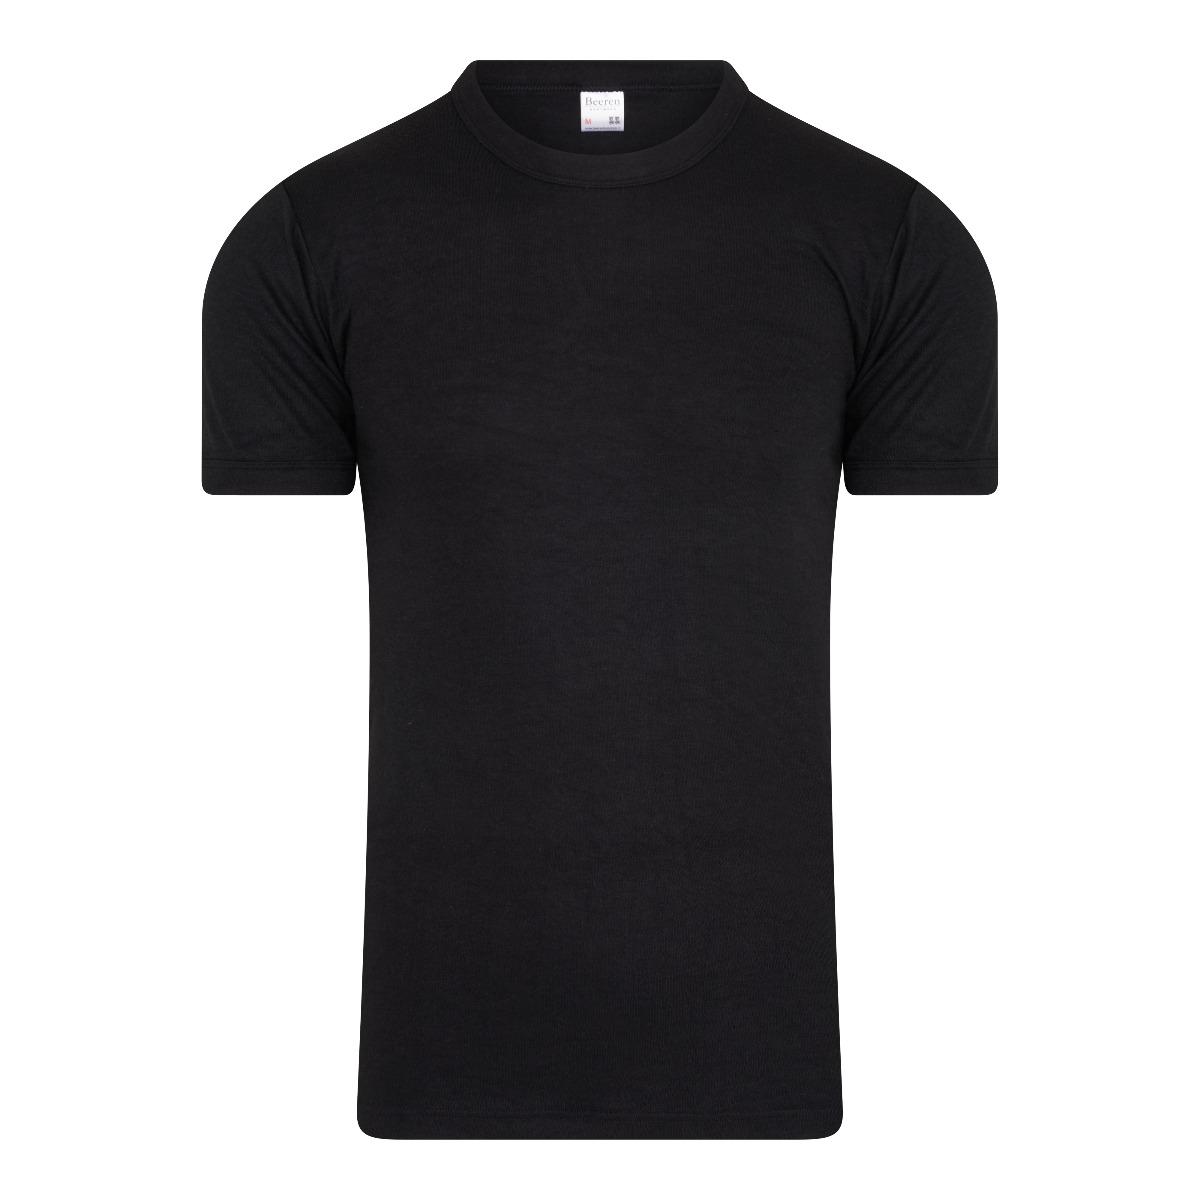 Beeren Thermo Heren T-shirt Zwart XL